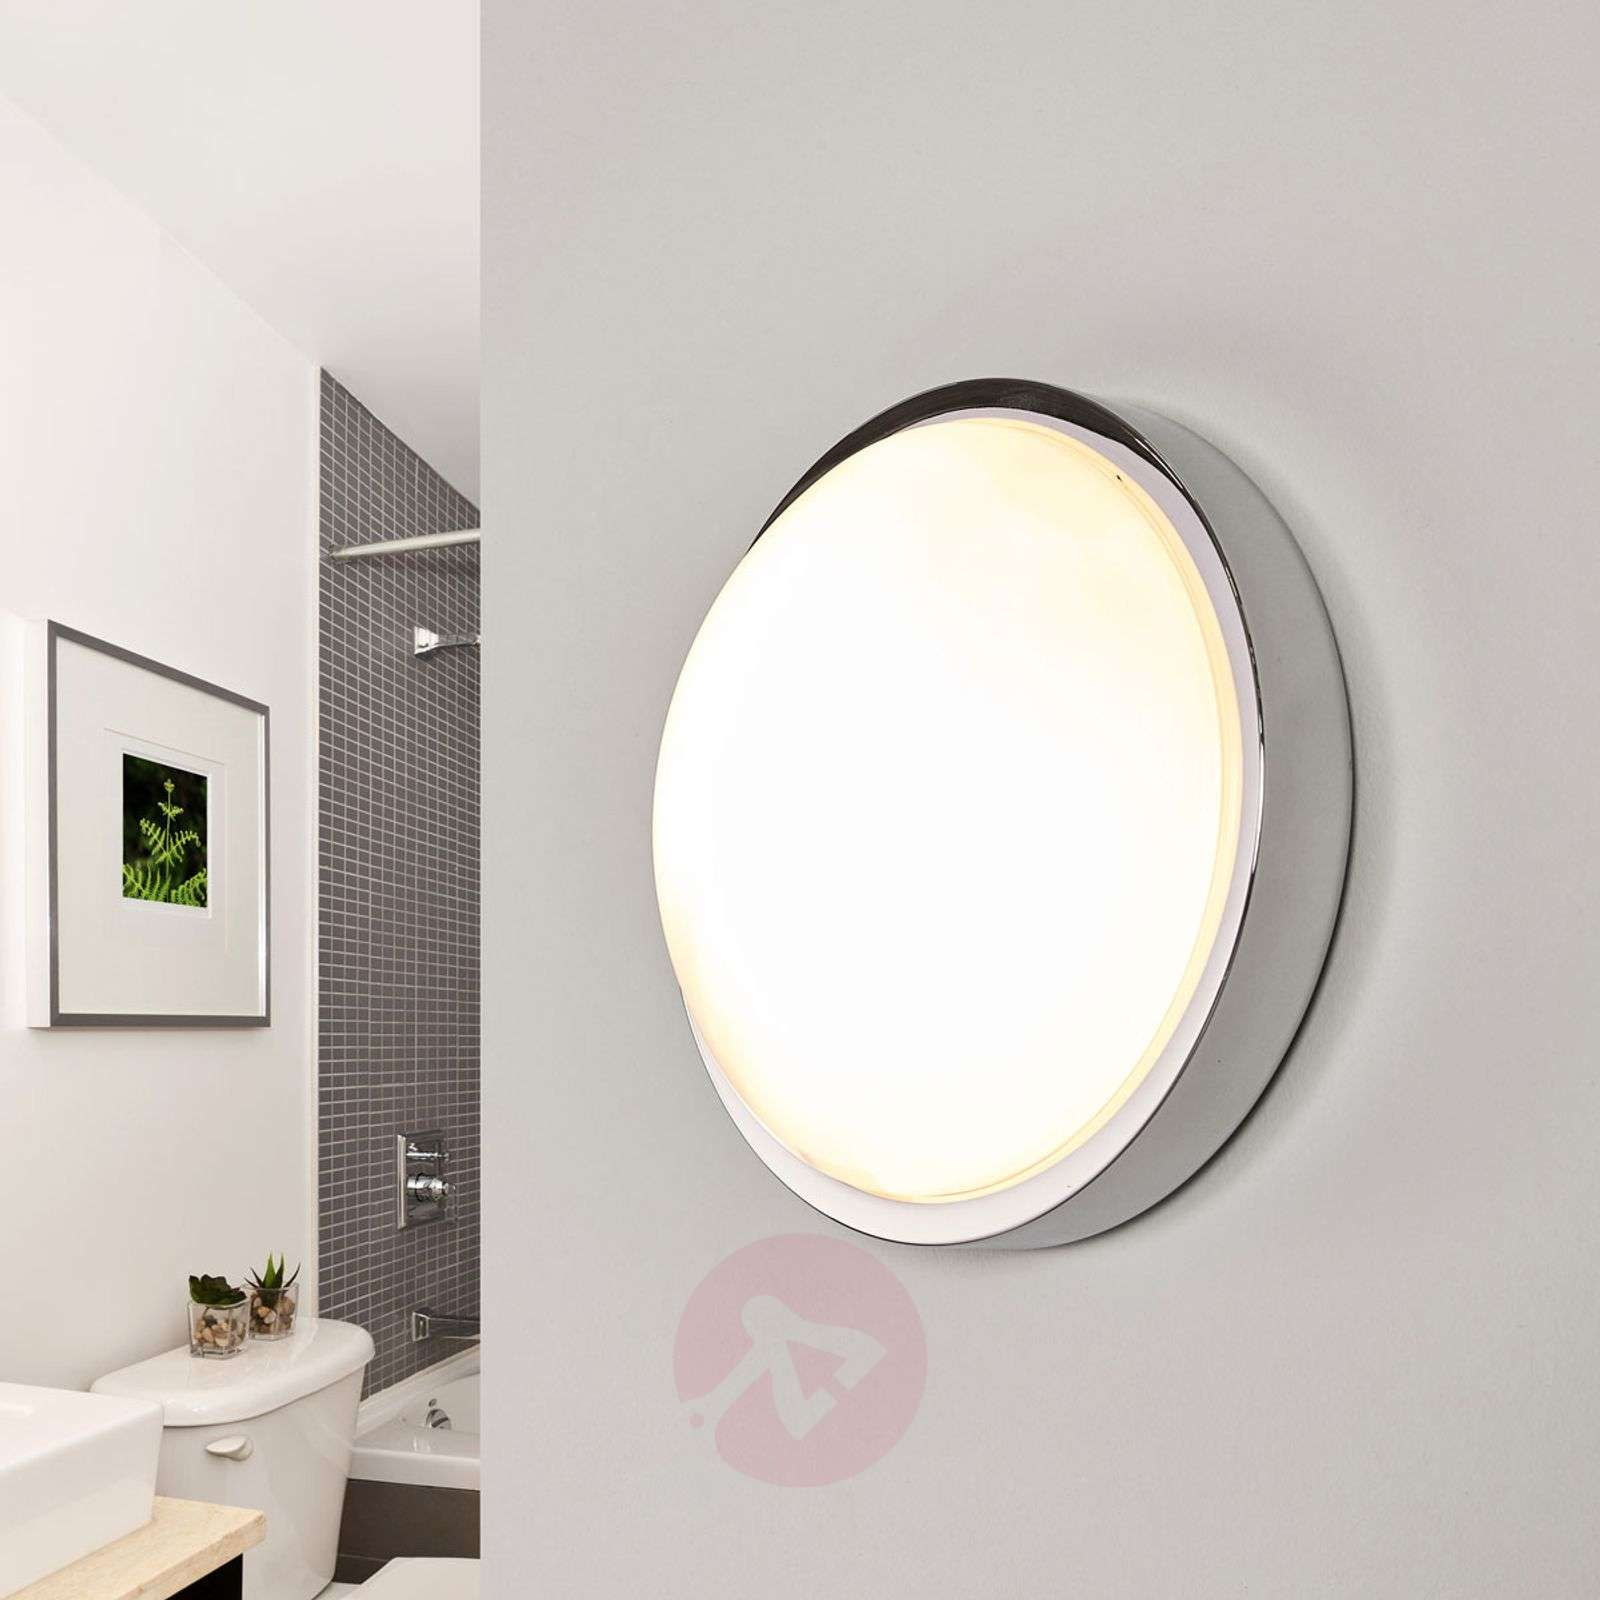 Chrome-plated bathroom ceiling lamp Elucio, IP44-9641093-08